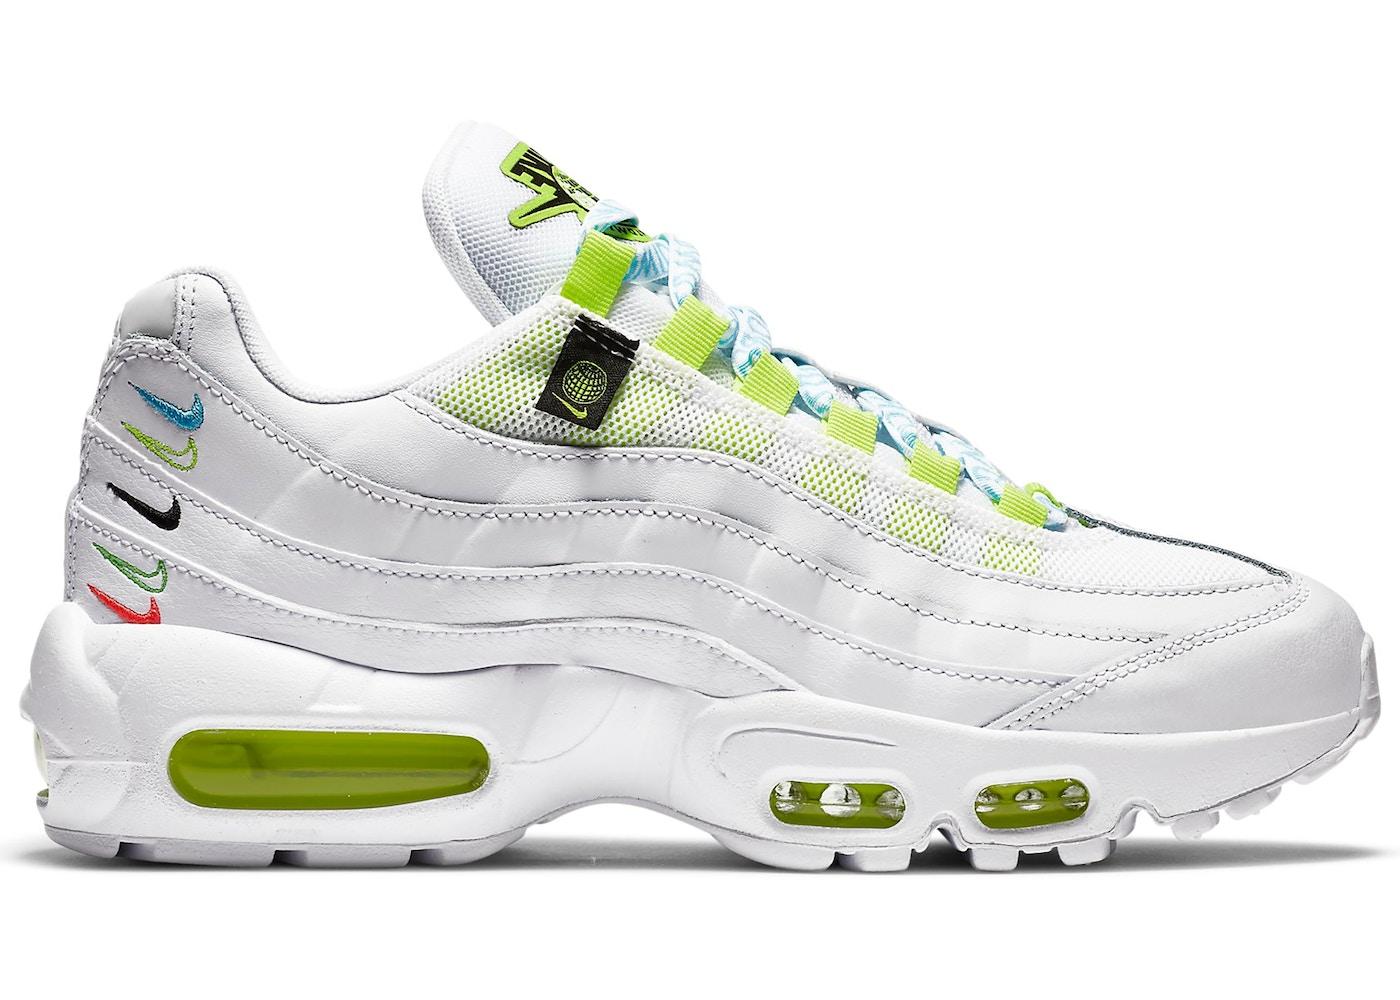 Nike Air Max 95 Worldwide White (W)